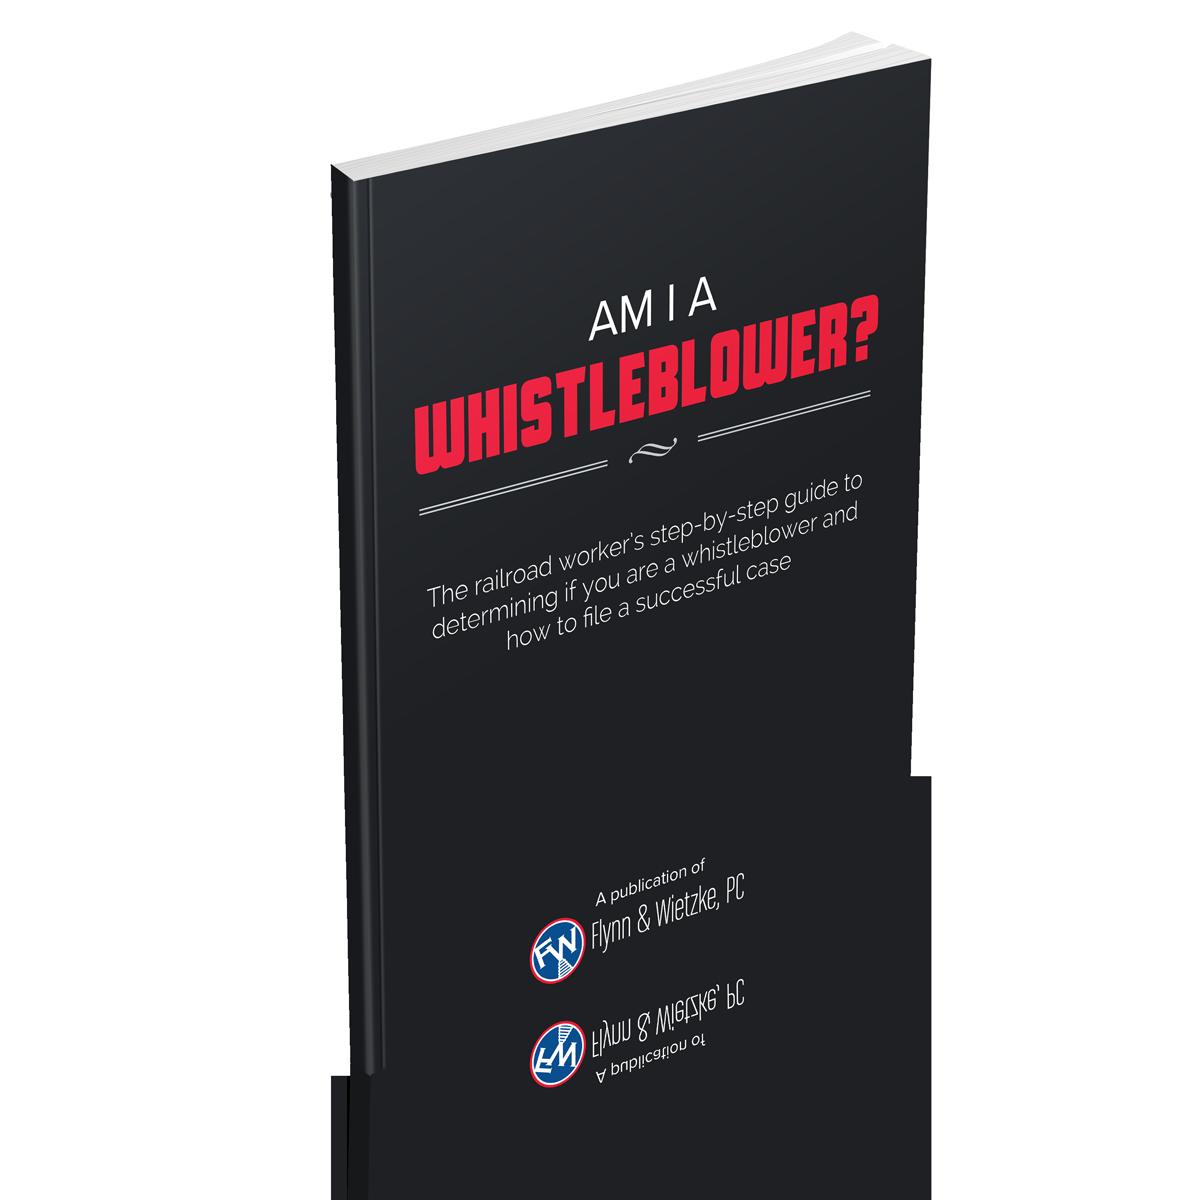 FELA_Whistleblower_Guide.png